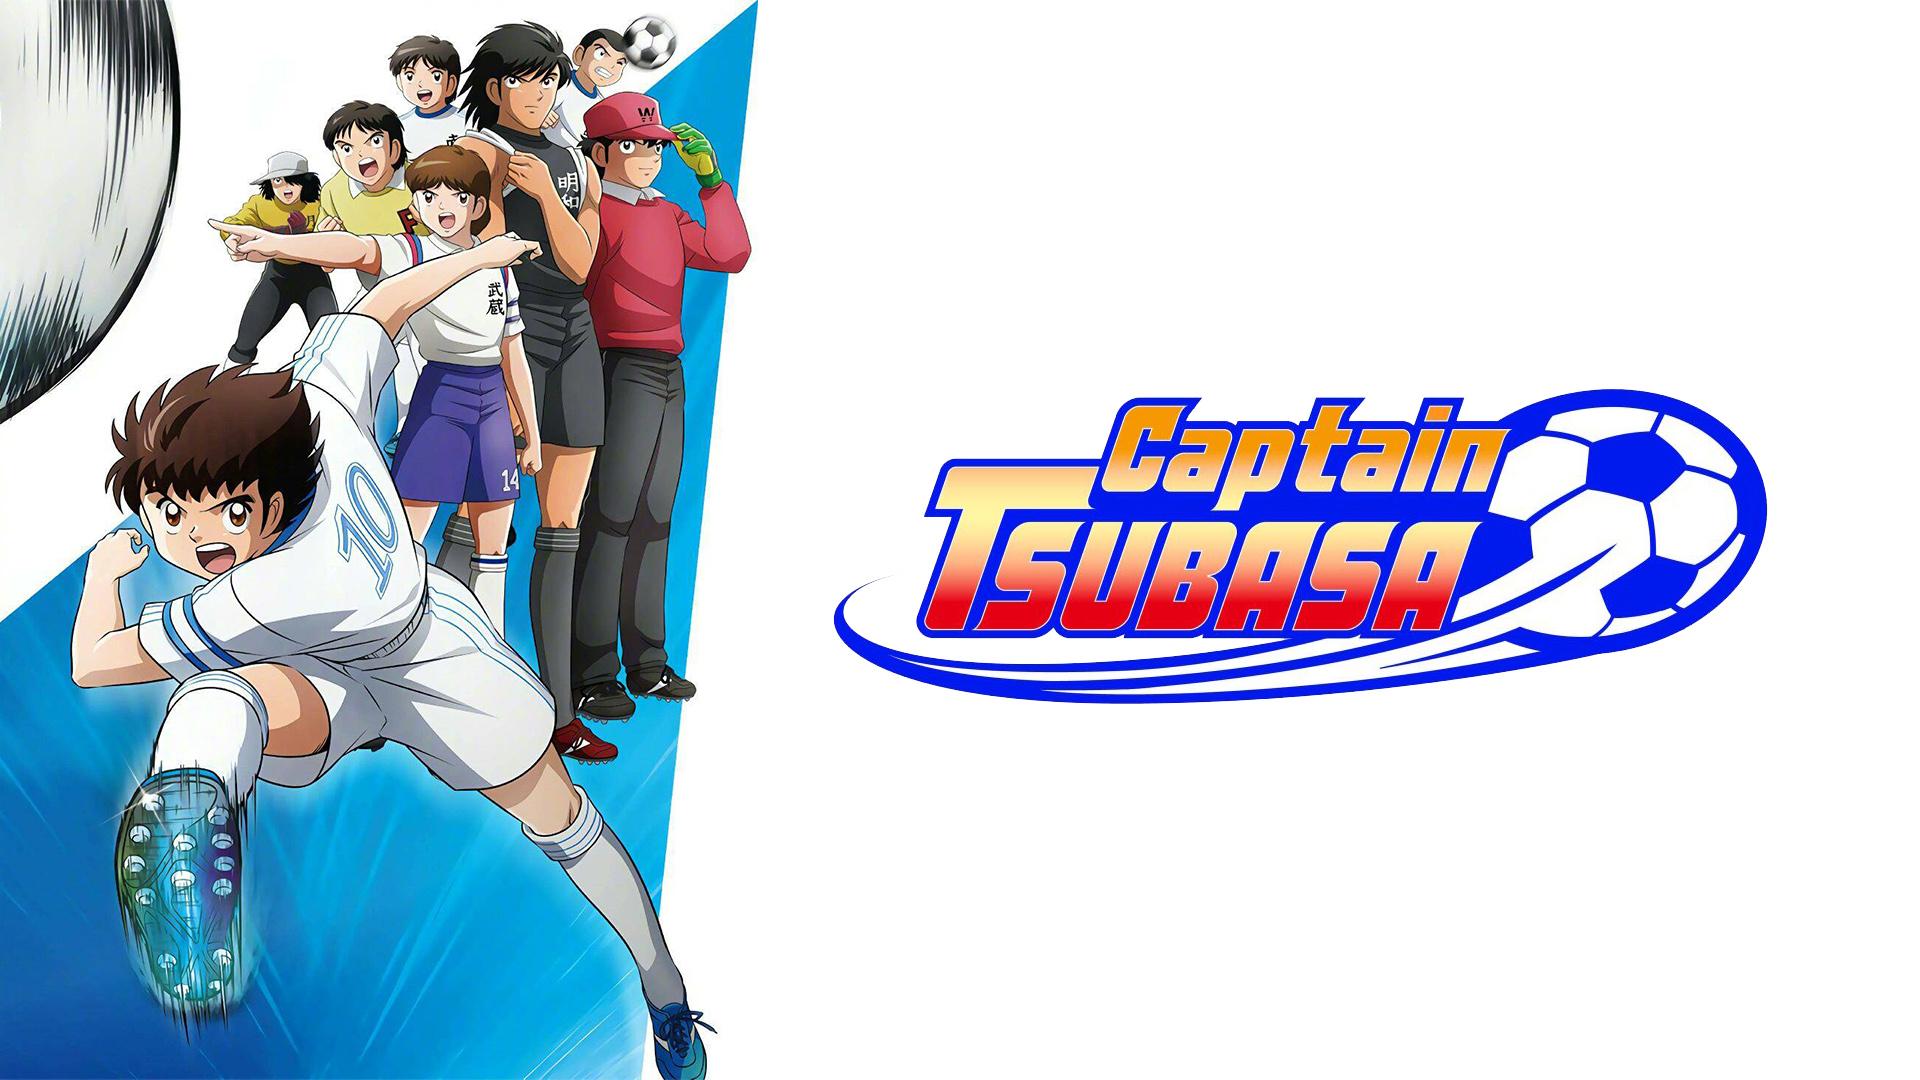 captain tsubasa 2019 ger sub